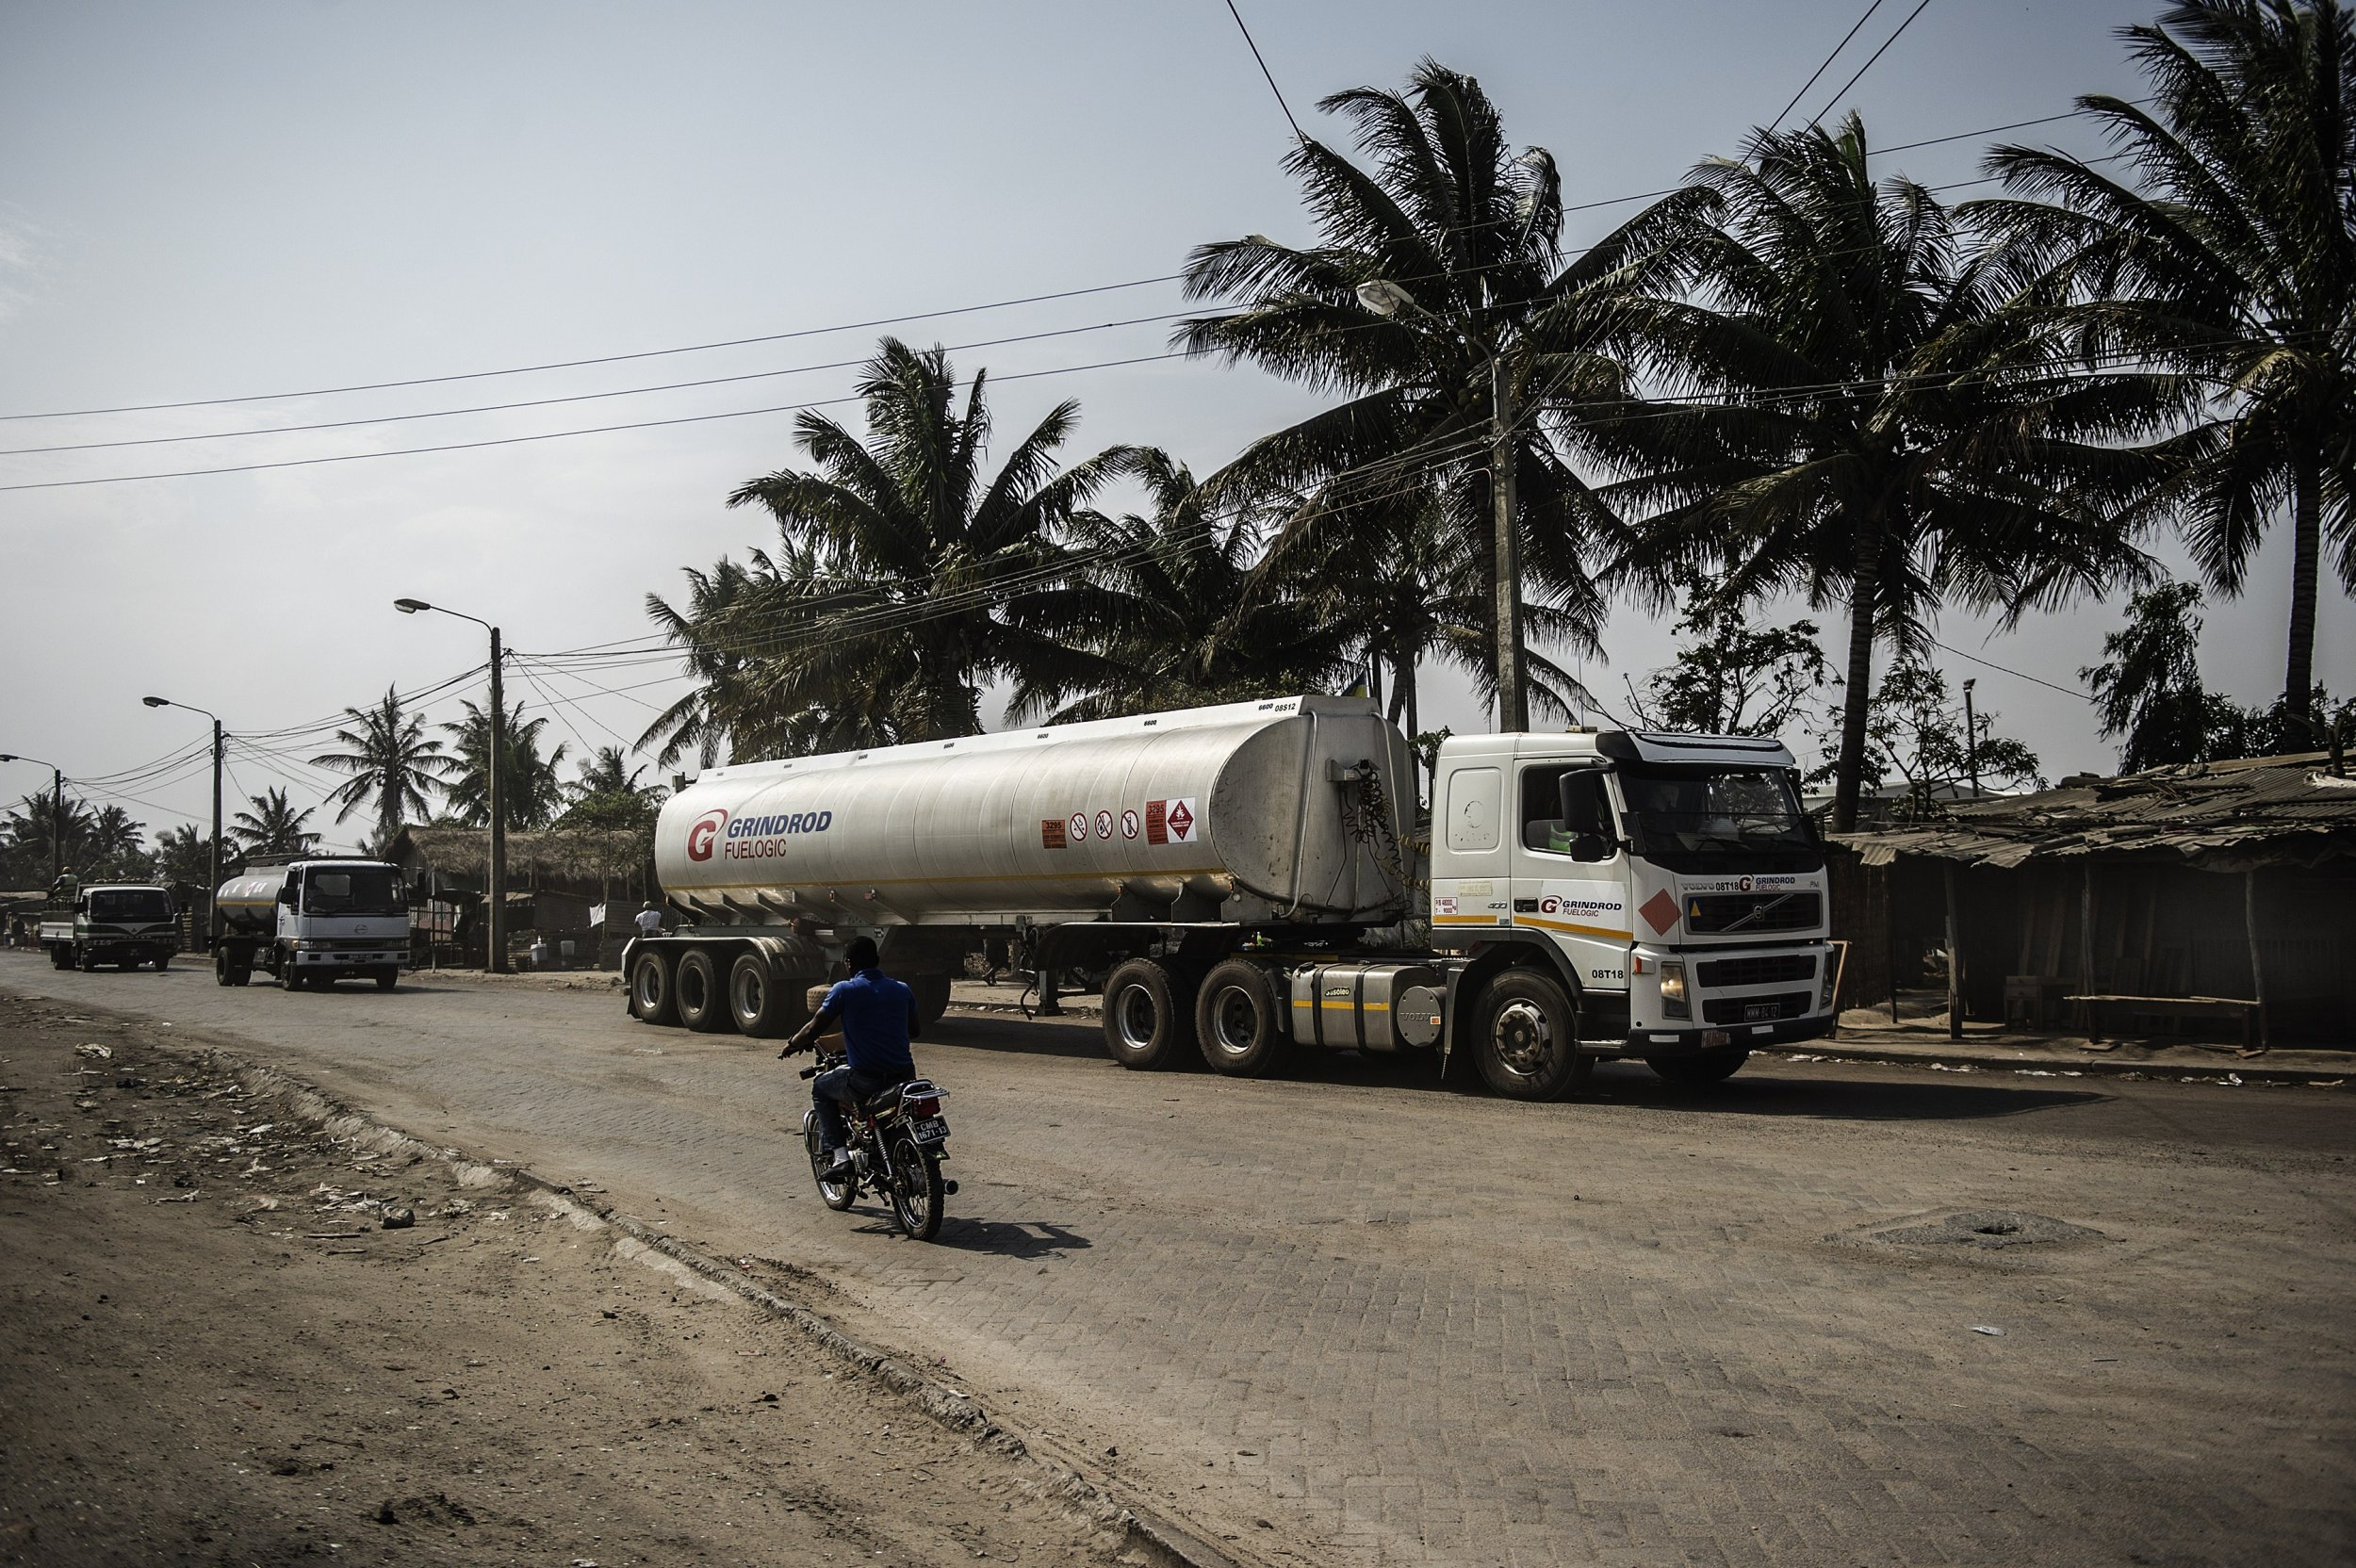 Mozambique fuel truck